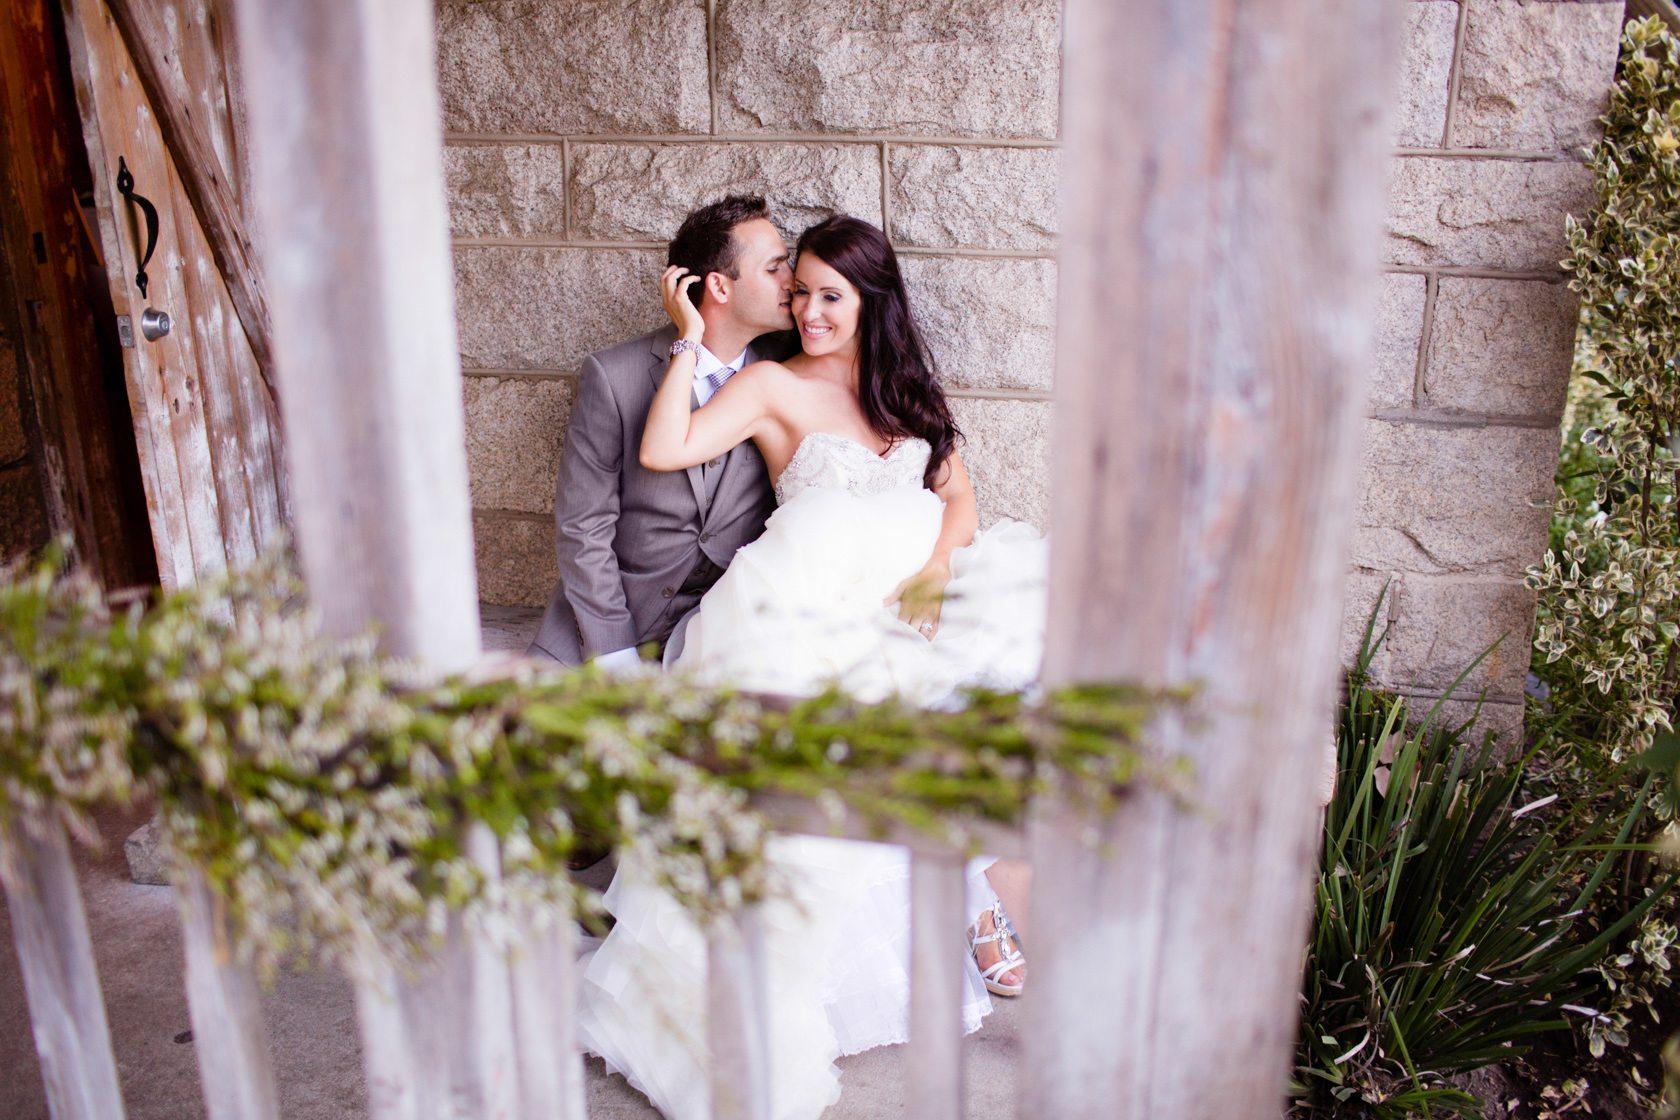 Temecula_Creek_Inn_Wedding_113.jpg